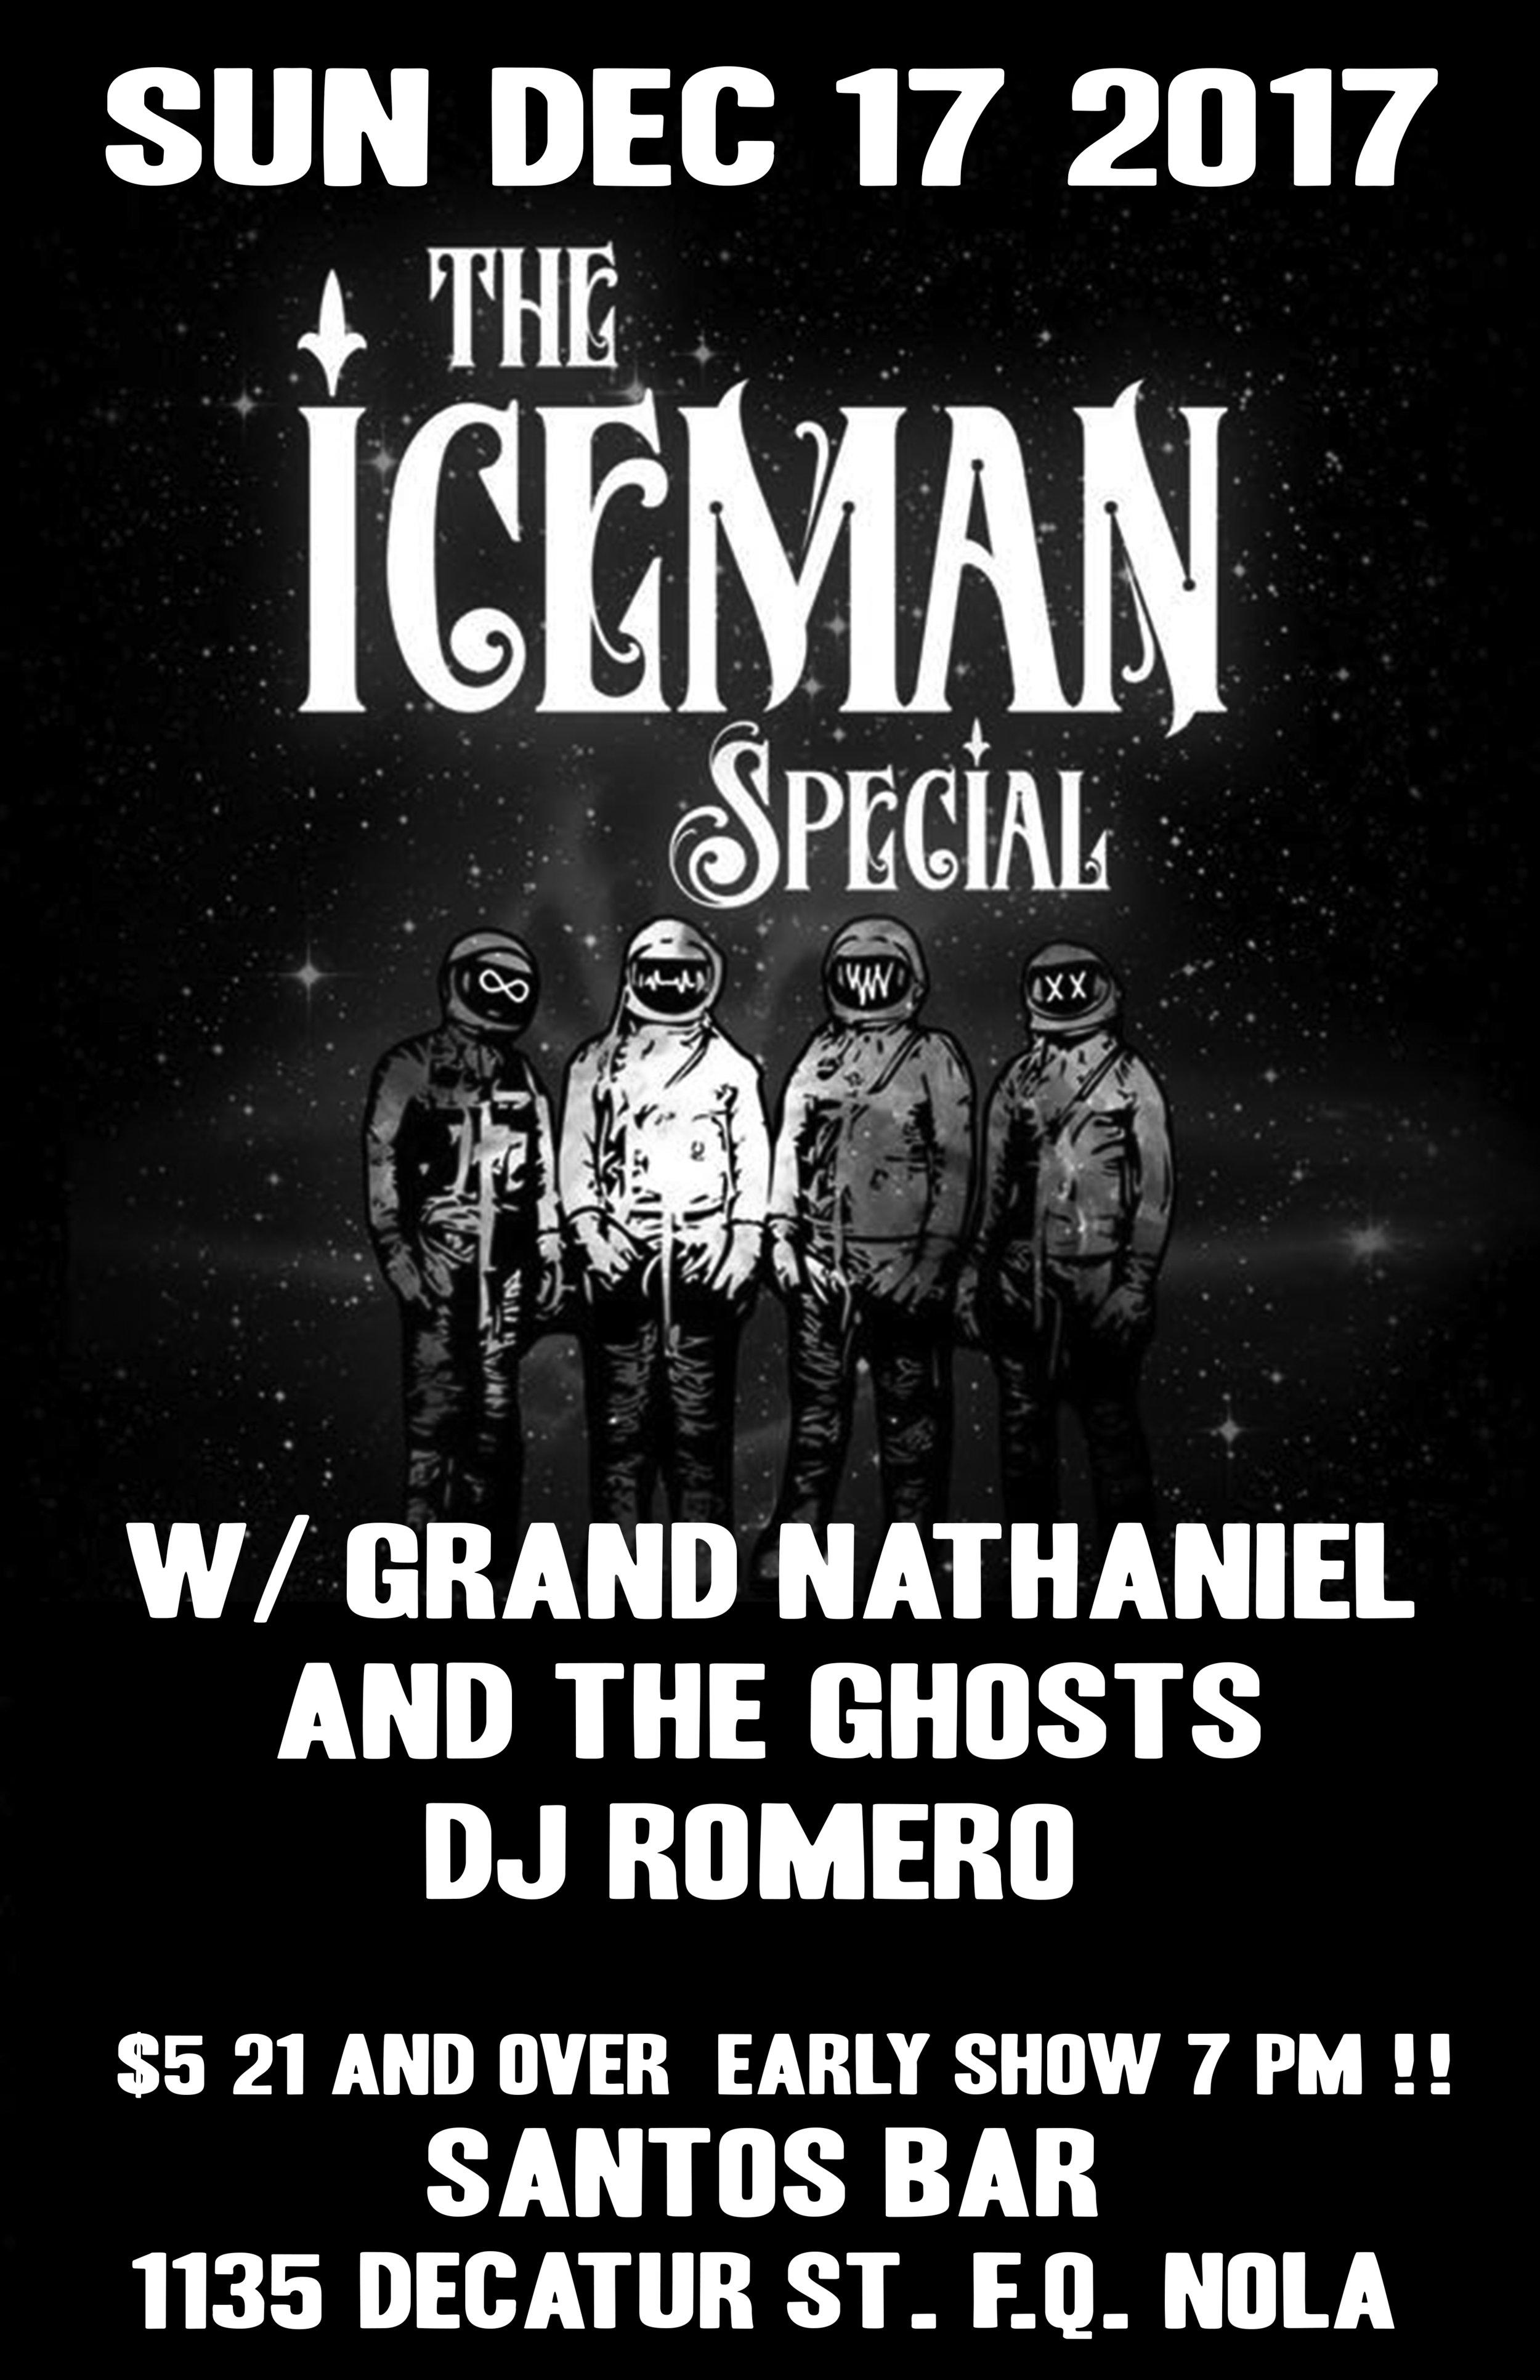 iceman special flyer.jpg